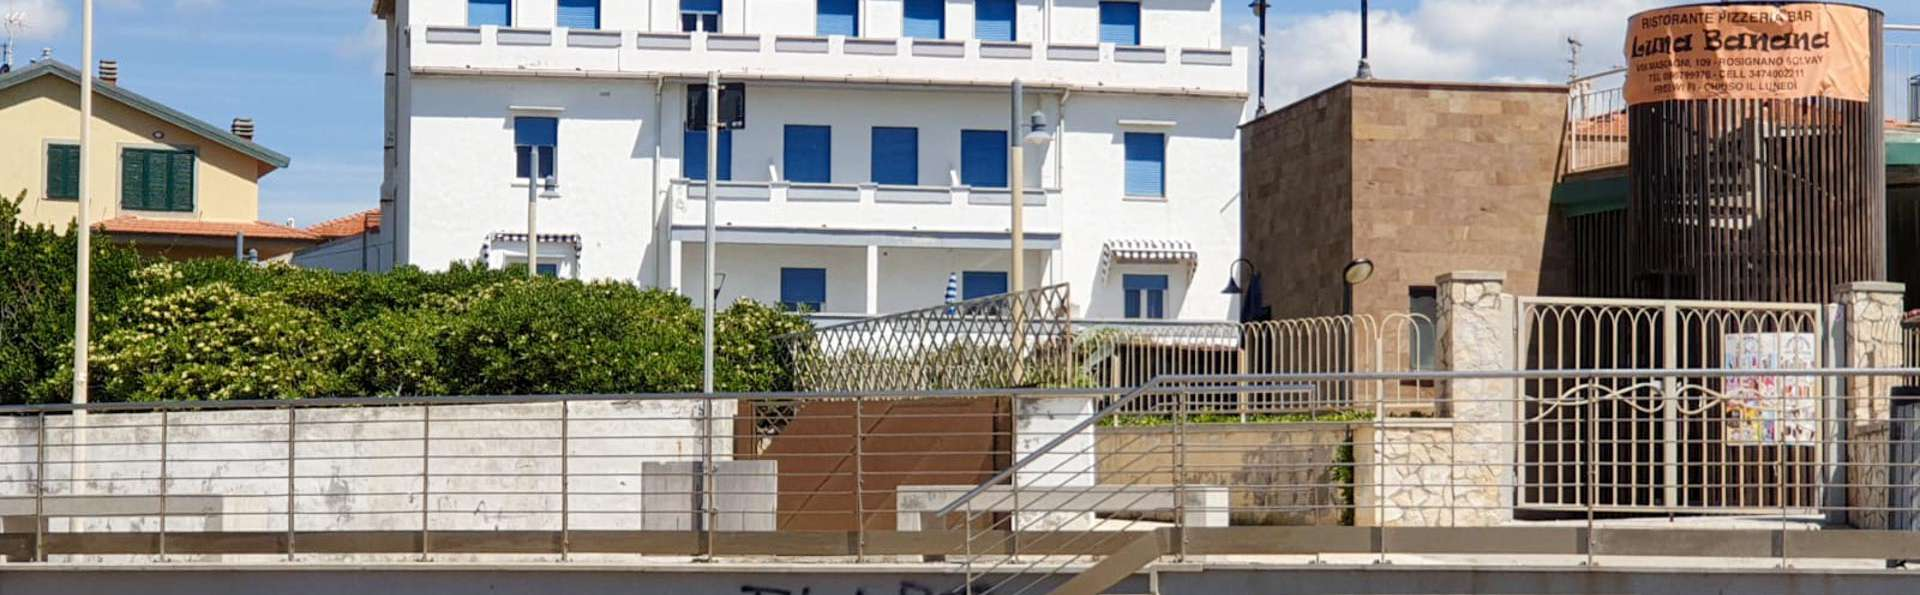 Hotel Villa dei Gerani - EDIT_FRONT_03.jpg